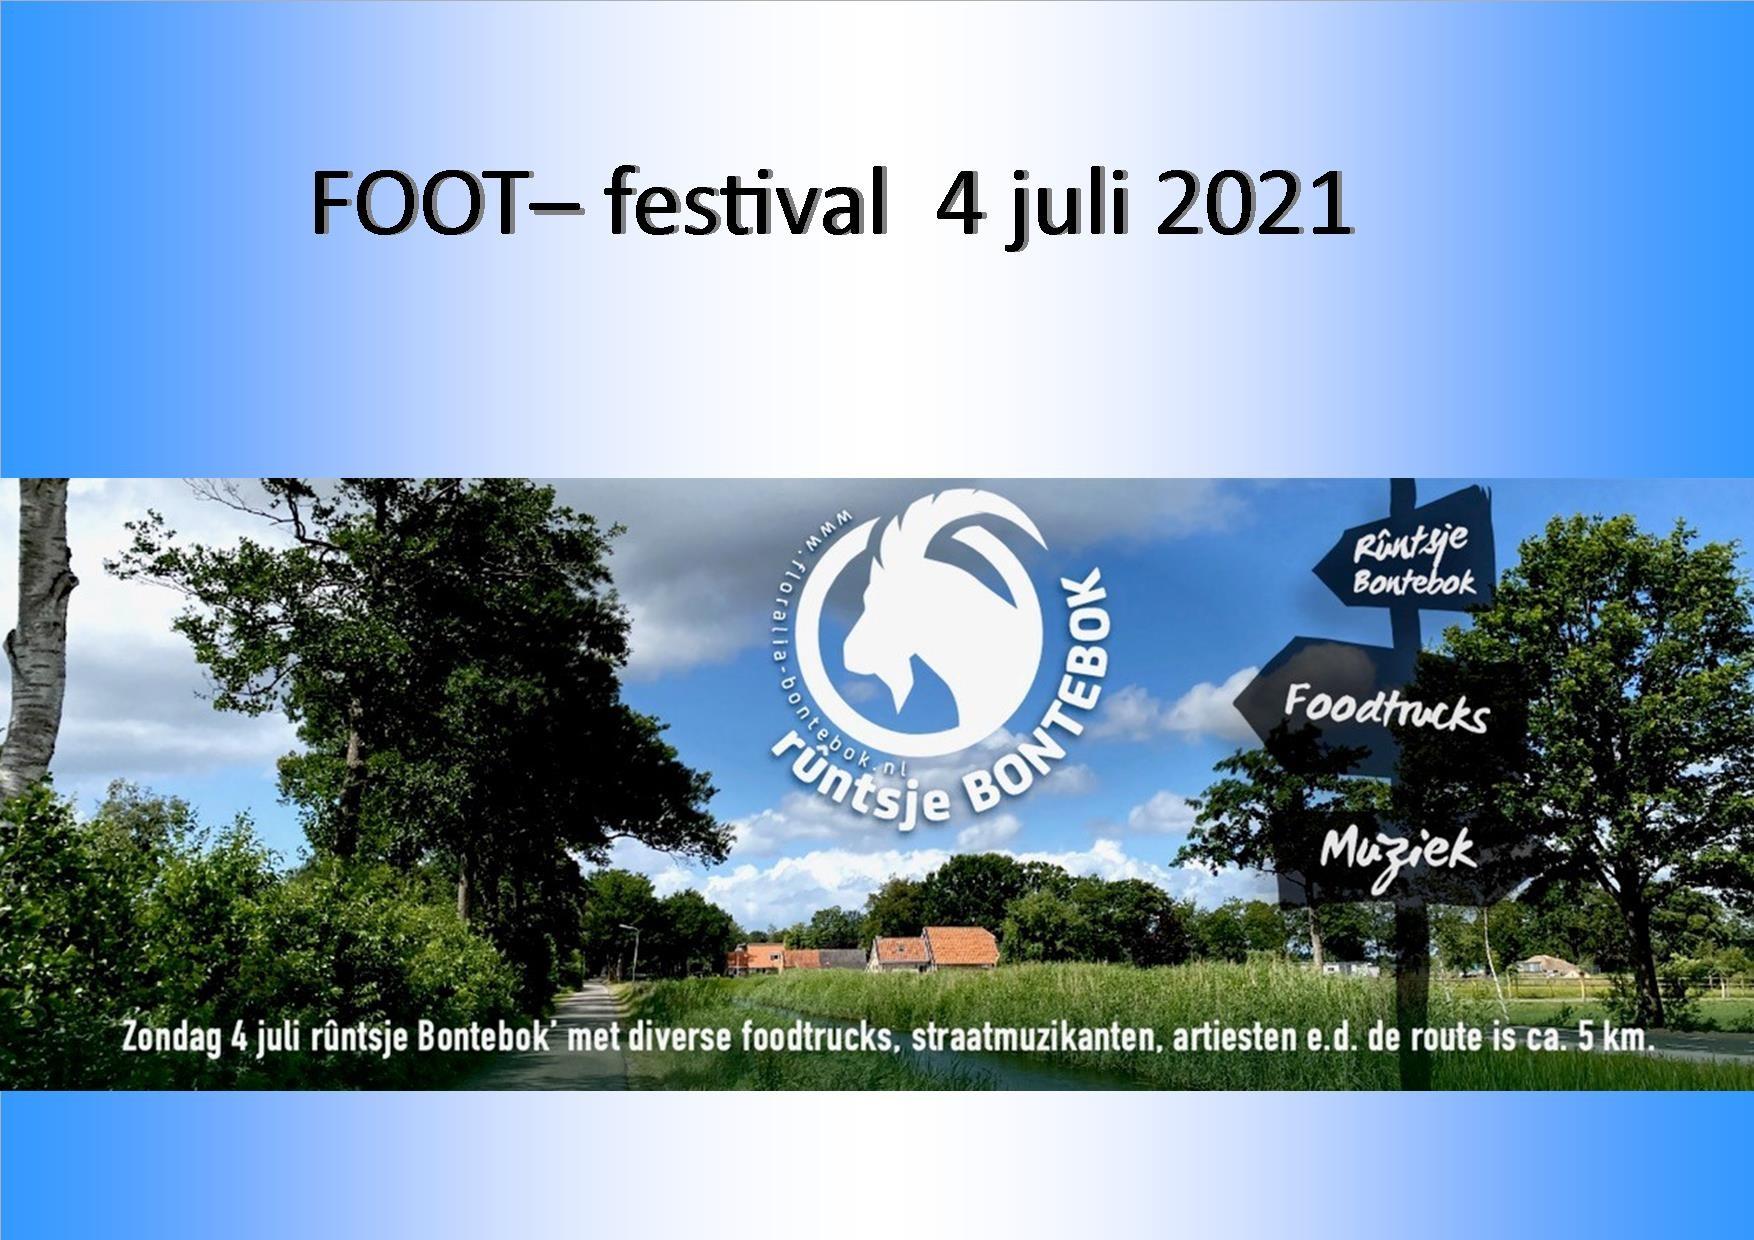 Foot festival voorkant